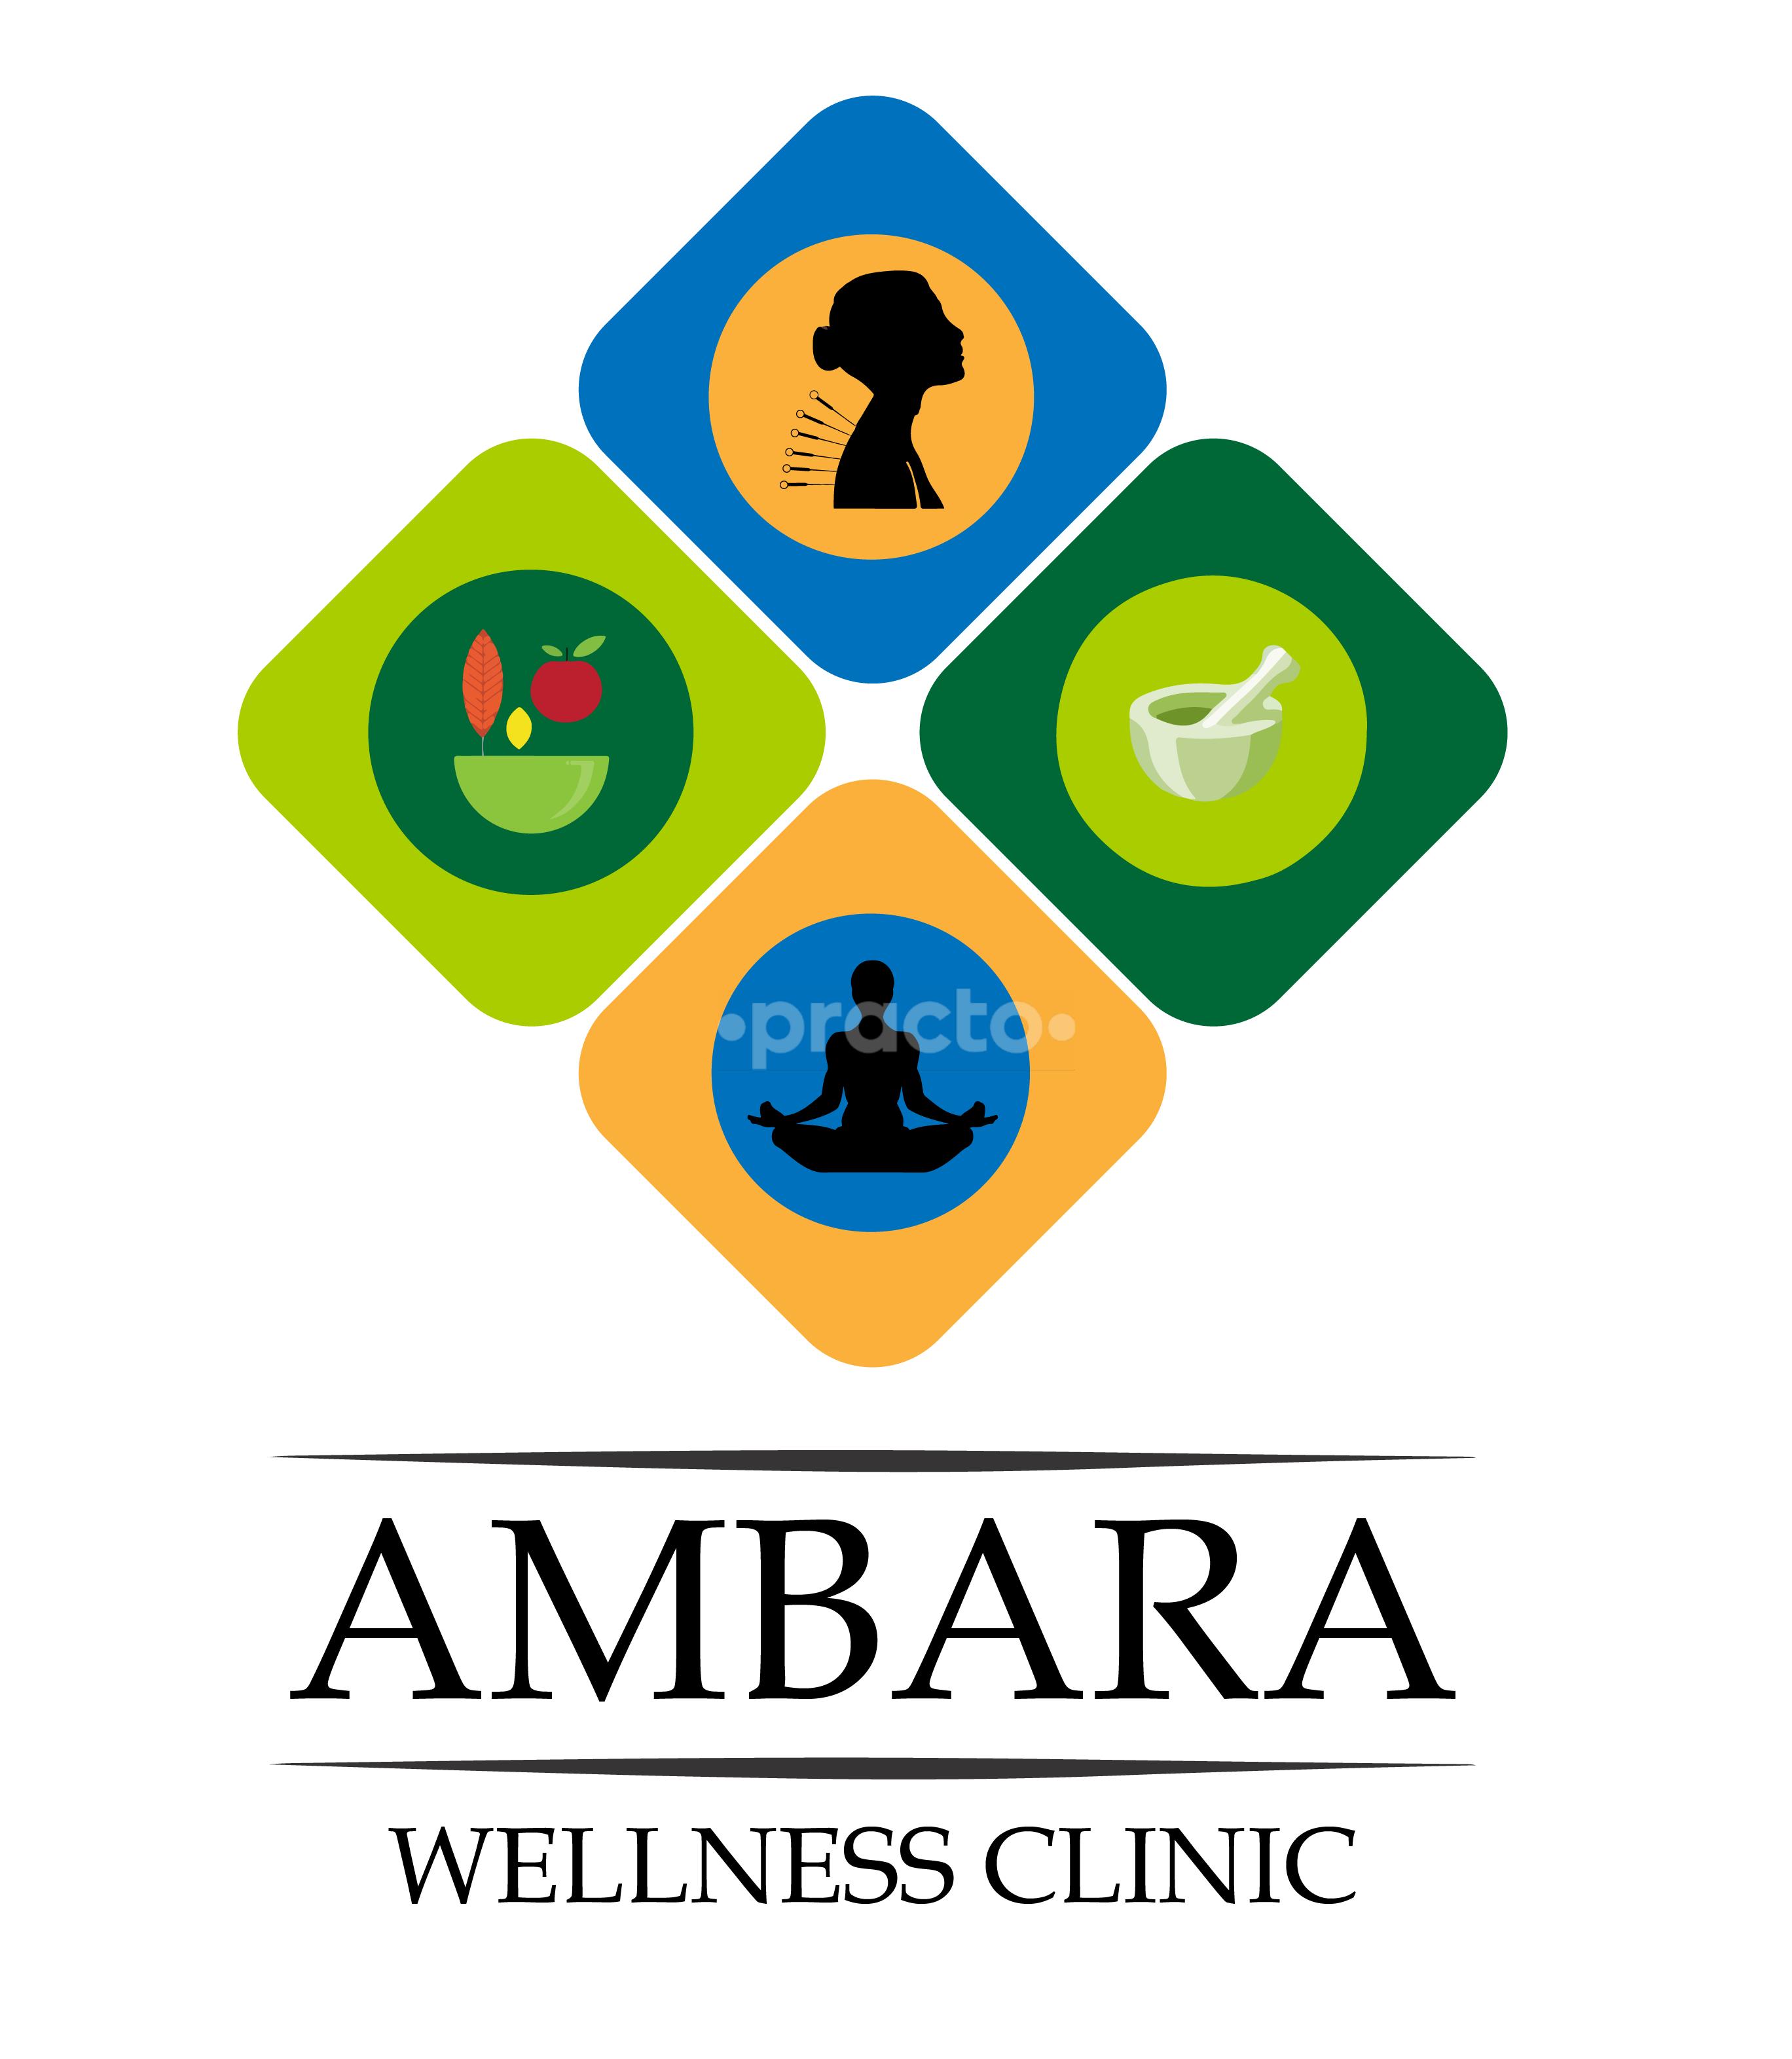 Ambara Wellness Clinic